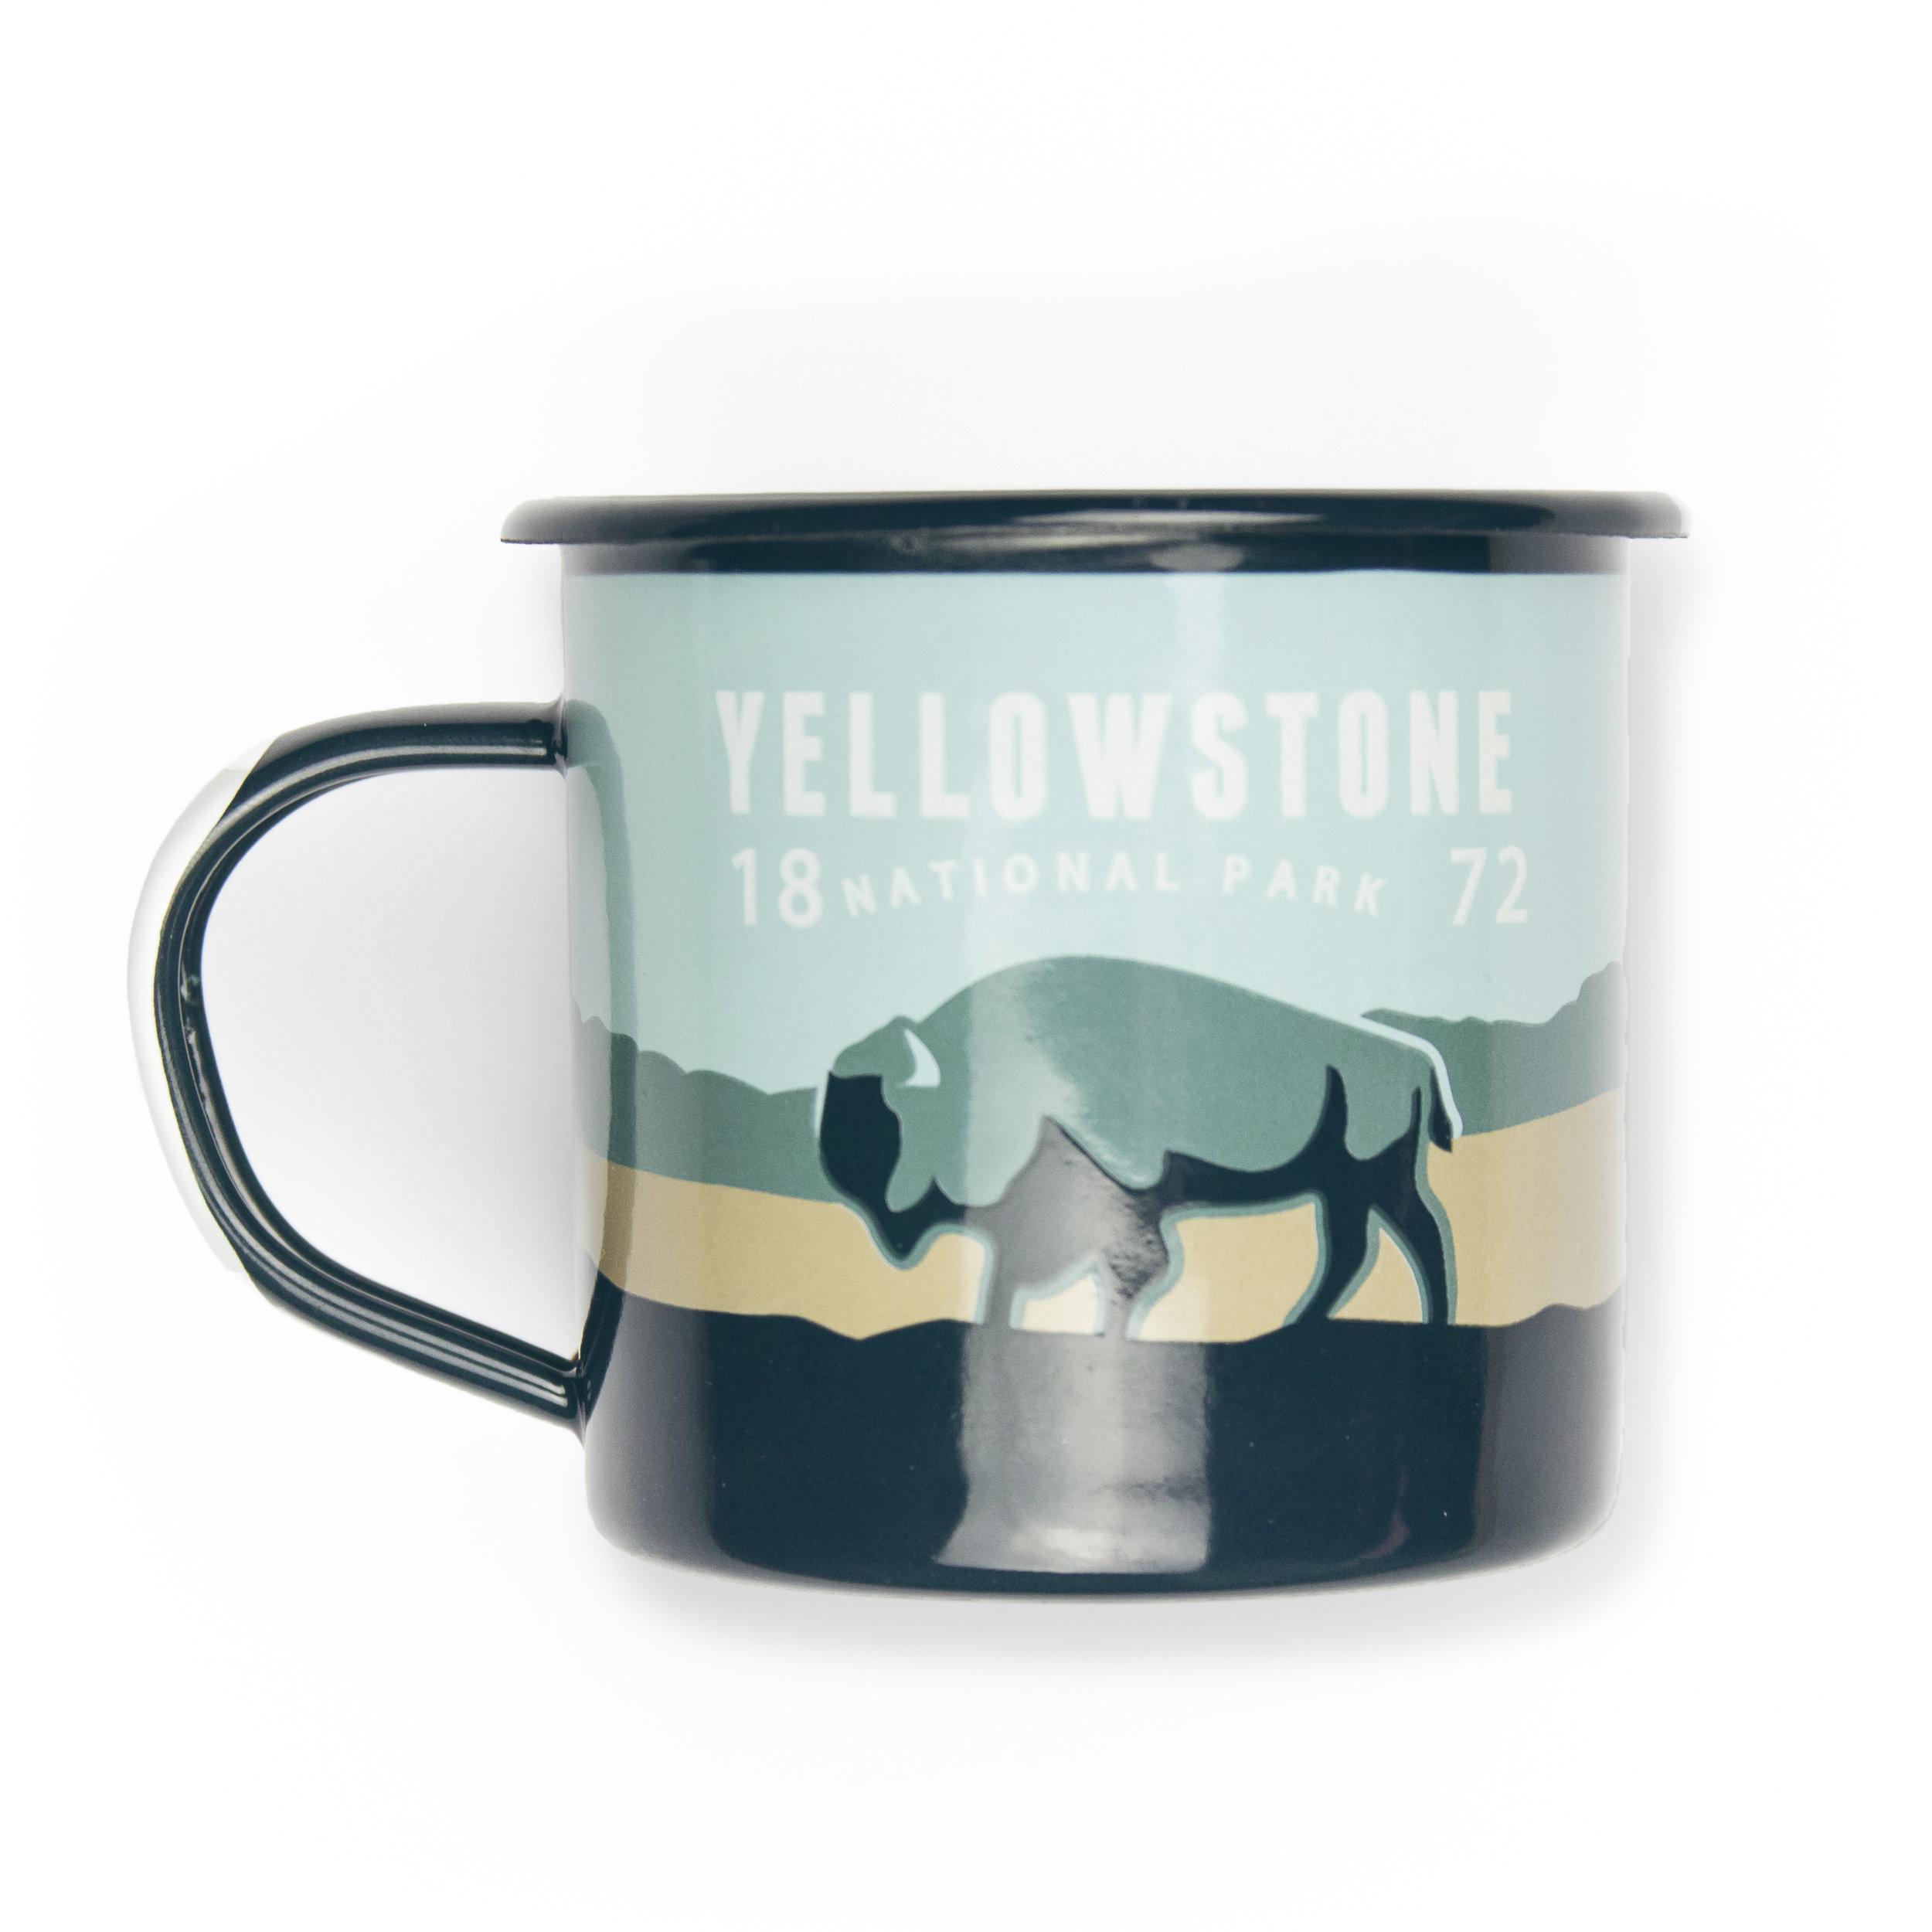 yellowstone_mug-1.jpg